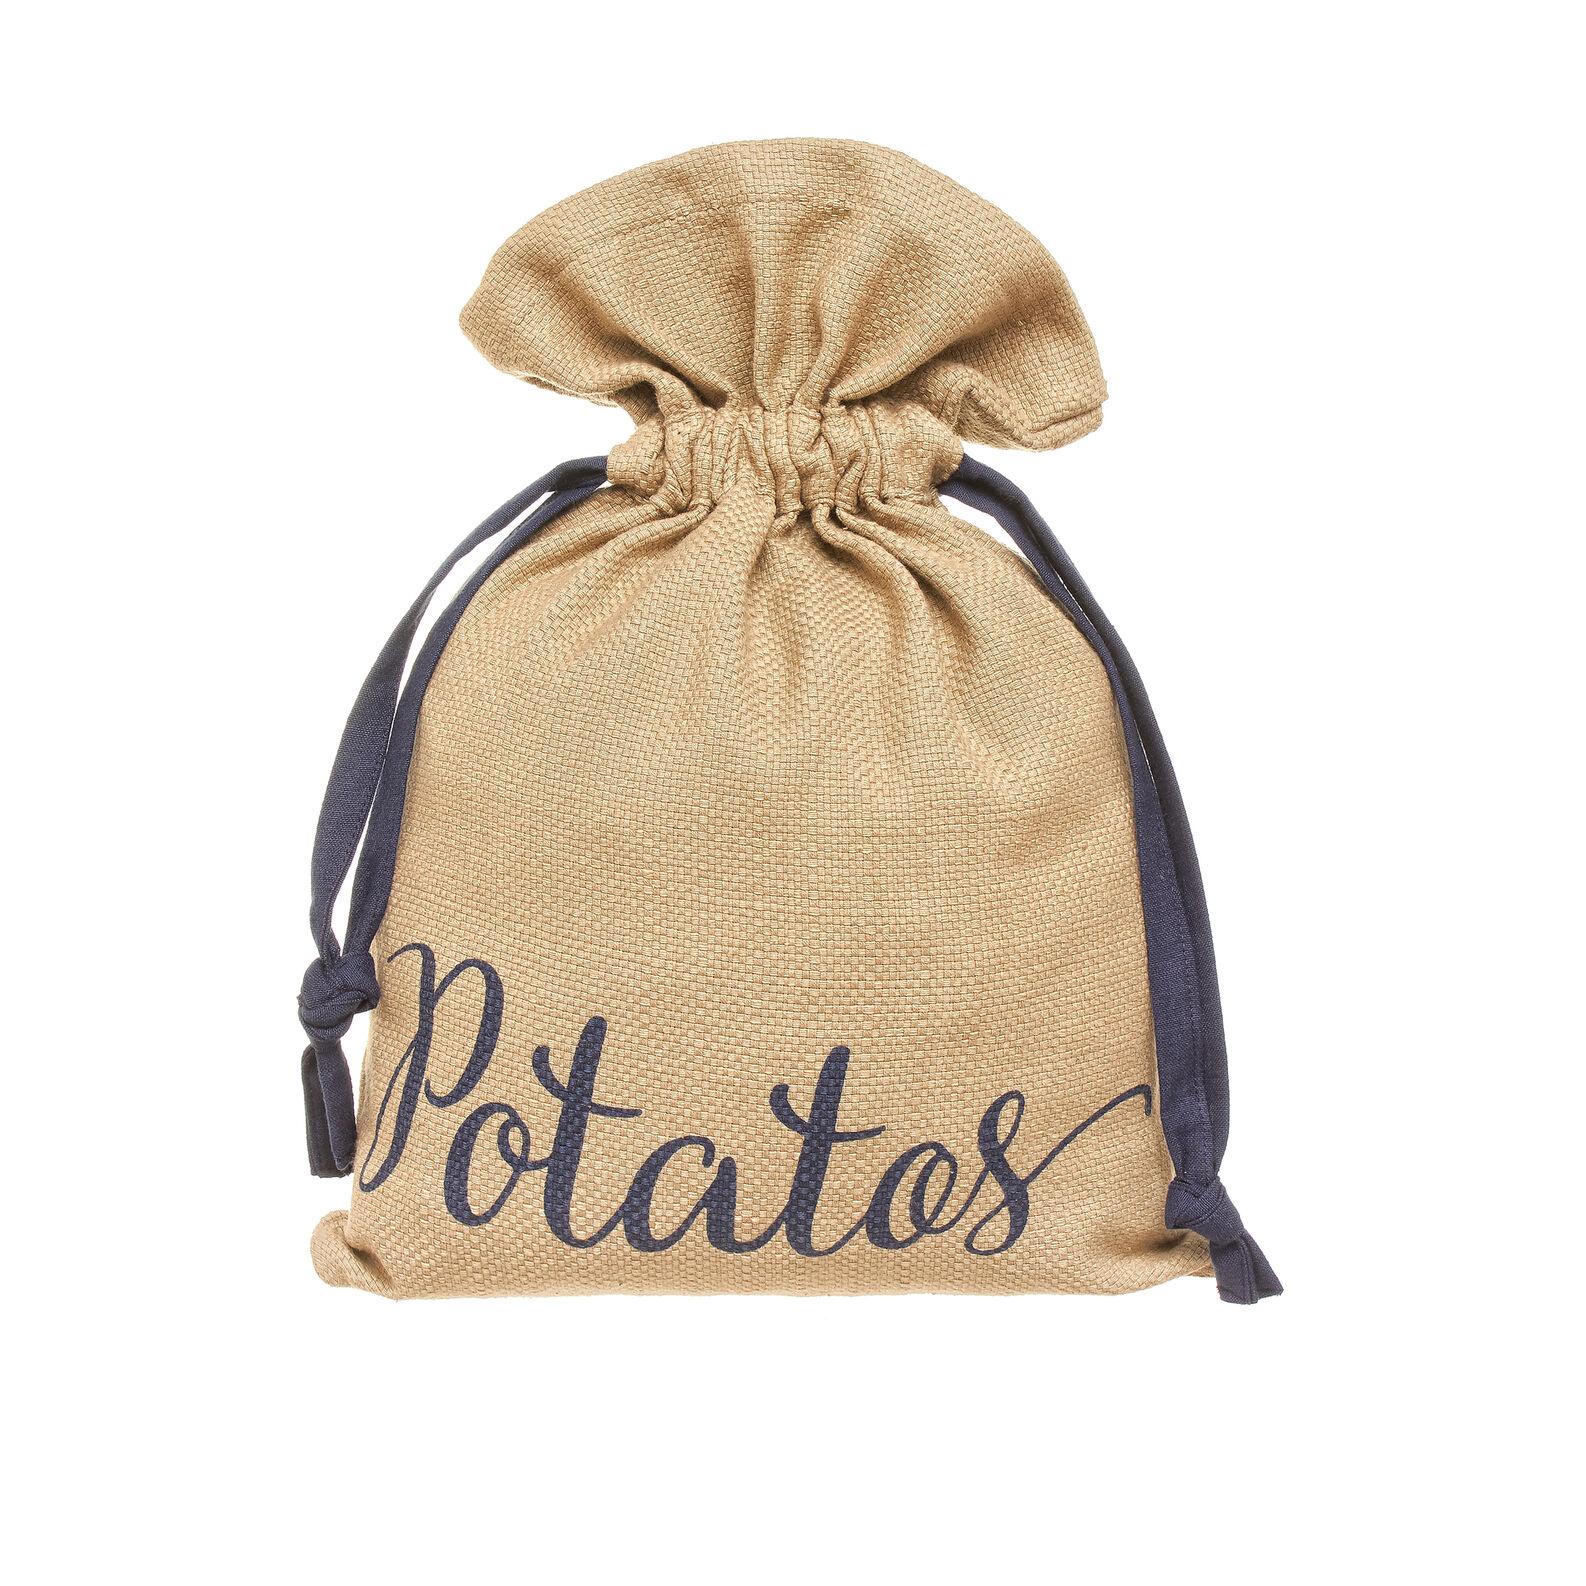 100% cotton Potato bag